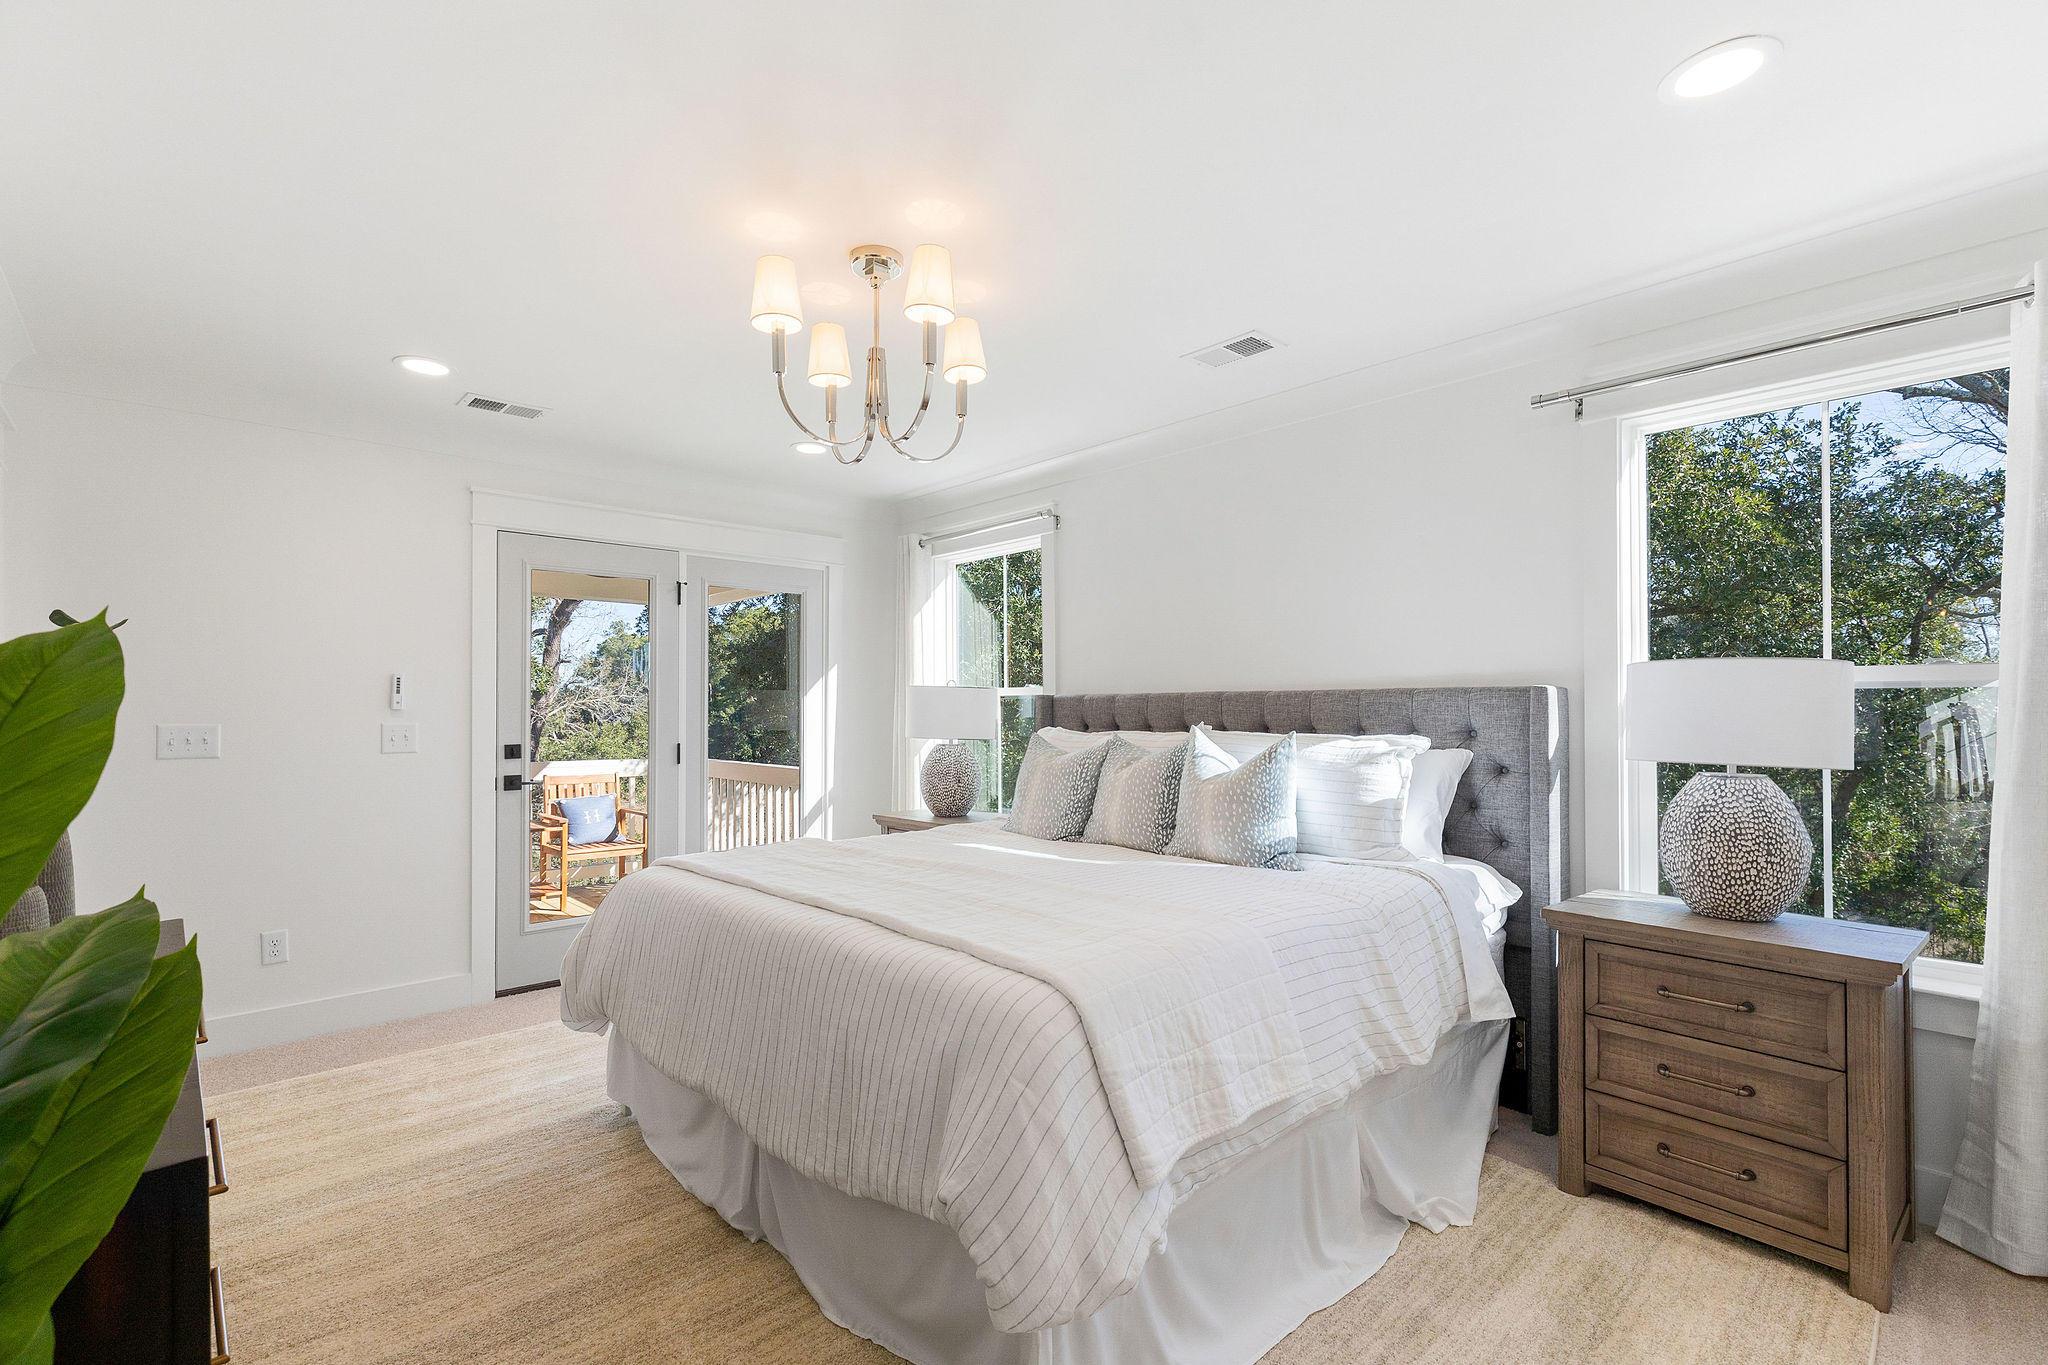 Avenue of Oaks Homes For Sale - 1027 Avenue Of Oaks, Charleston, SC - 16